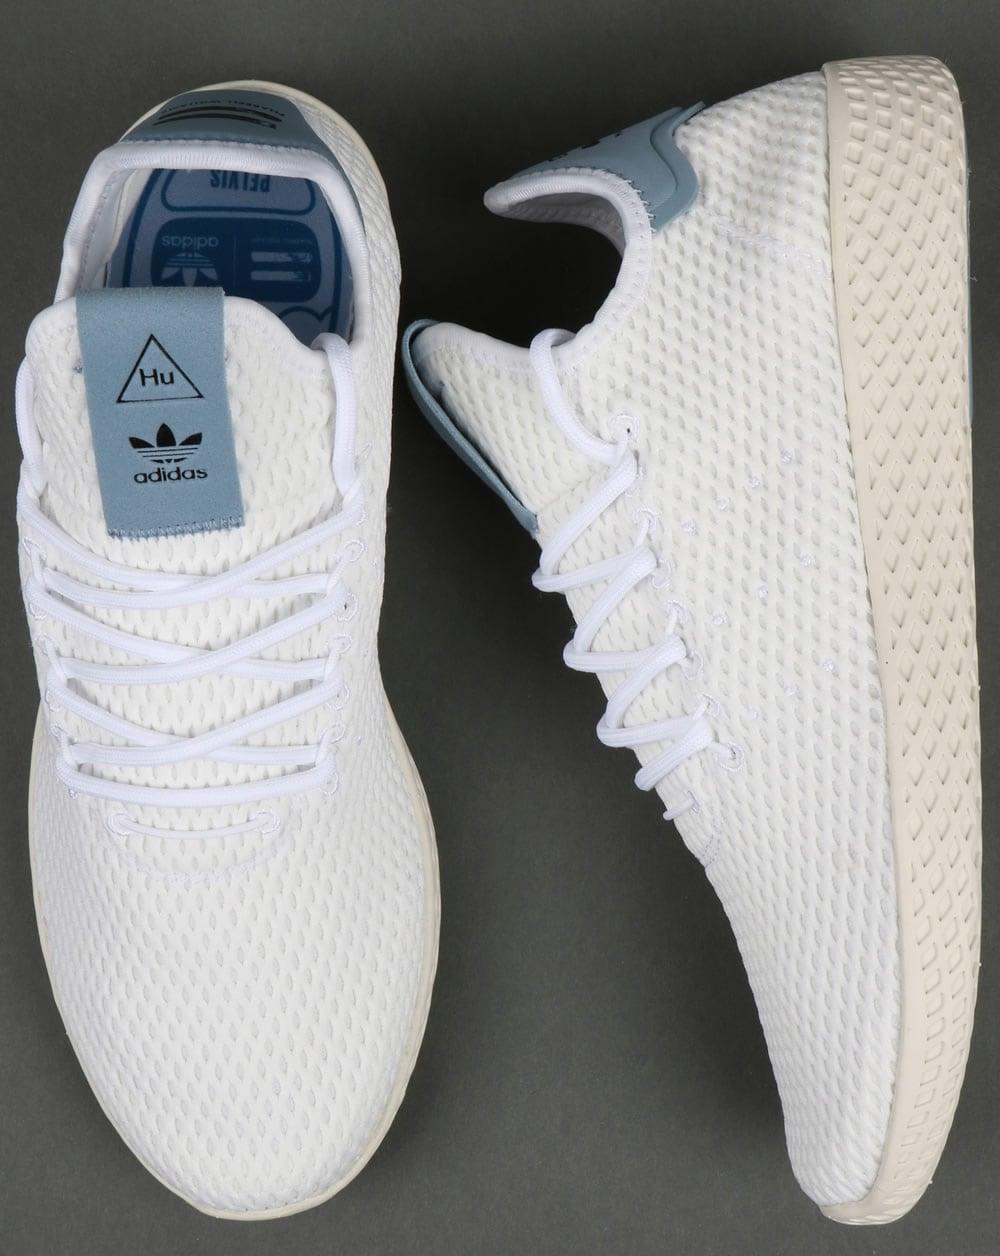 03e7dbde8 Adidas PW Tennis HU Trainers White Tactile Blue